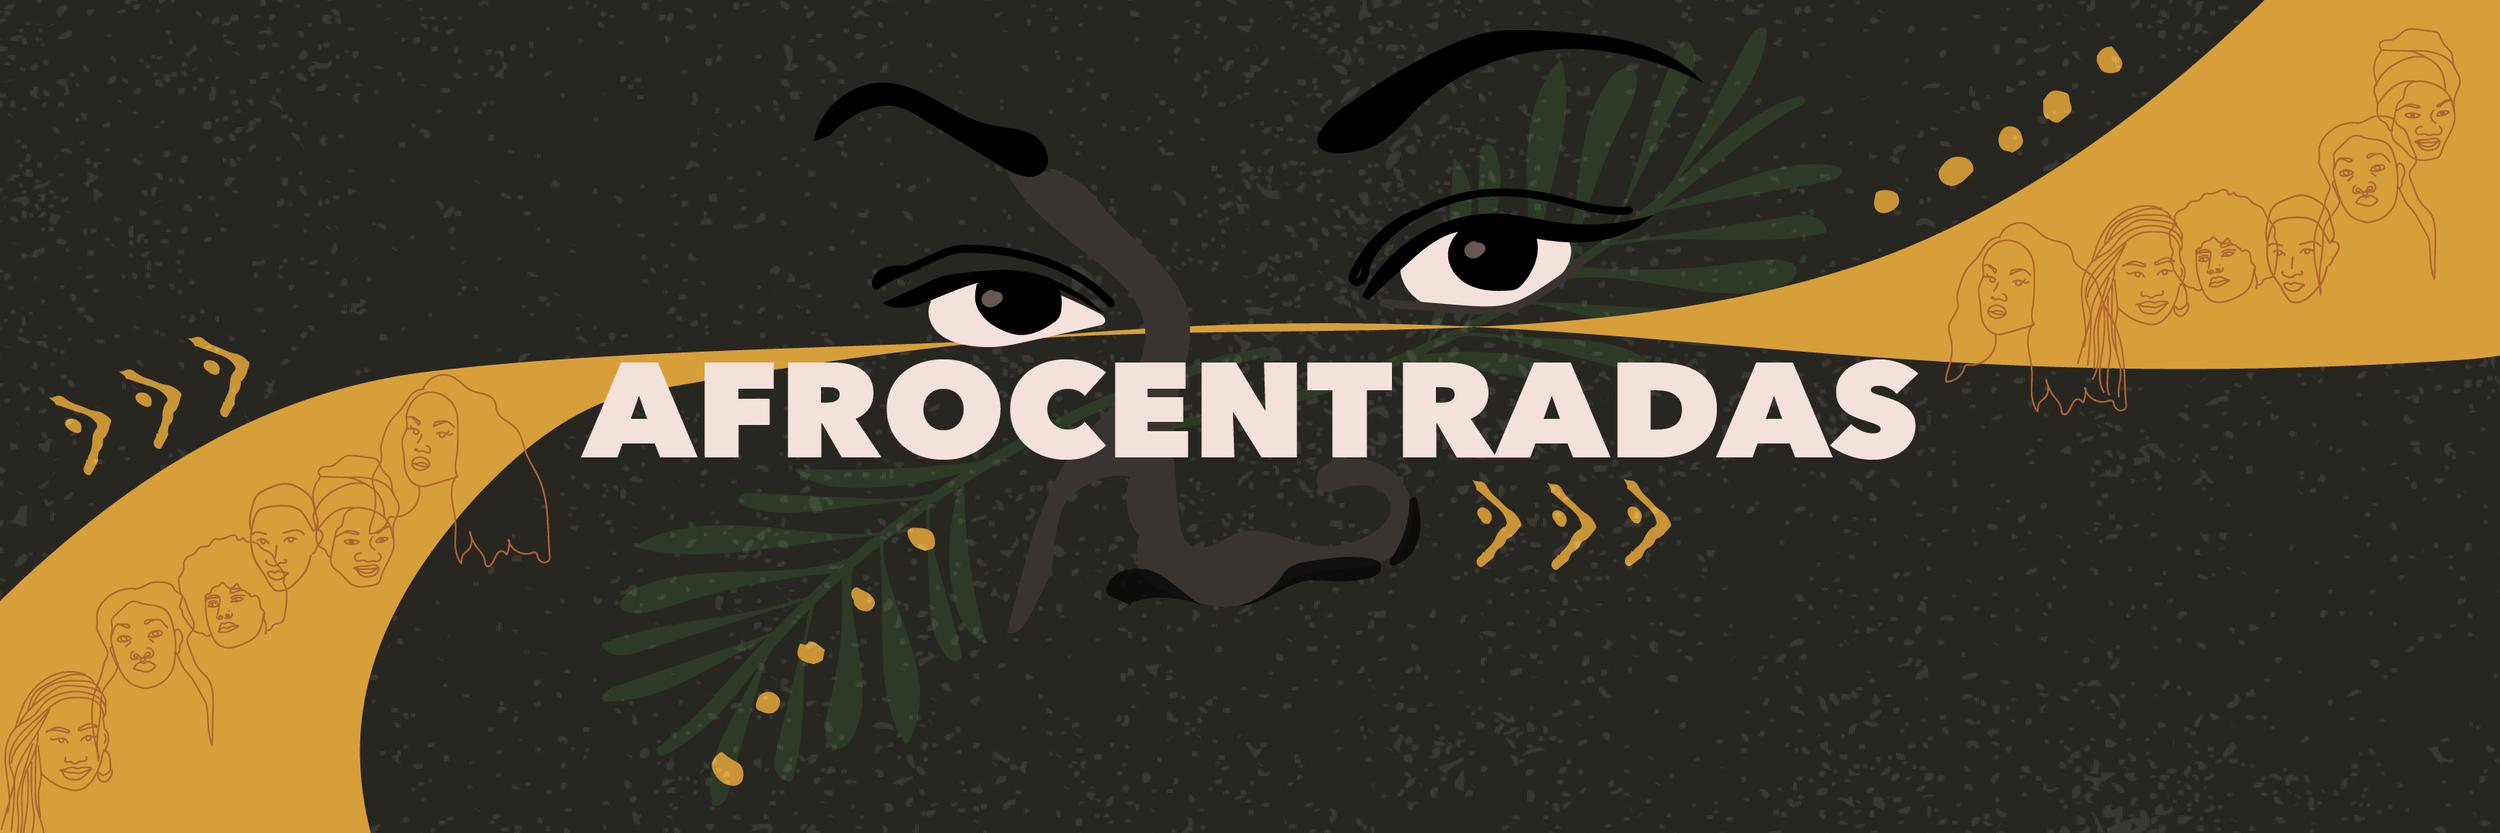 Afrocentradas